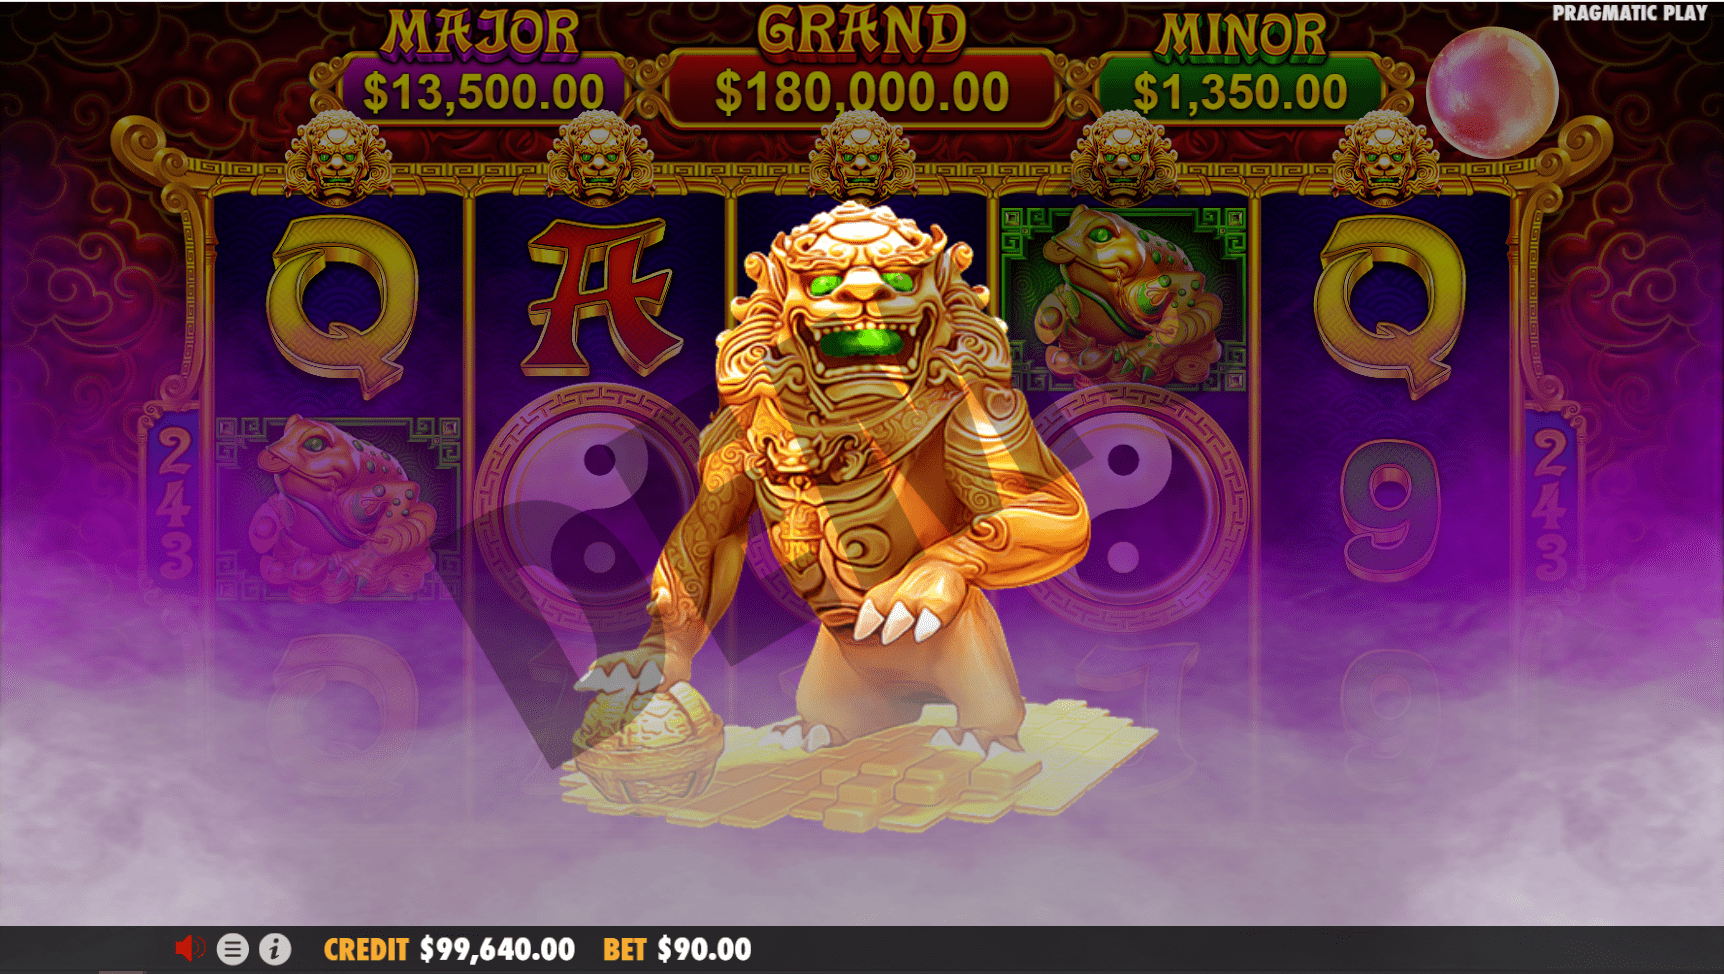 5 lions gold slot review